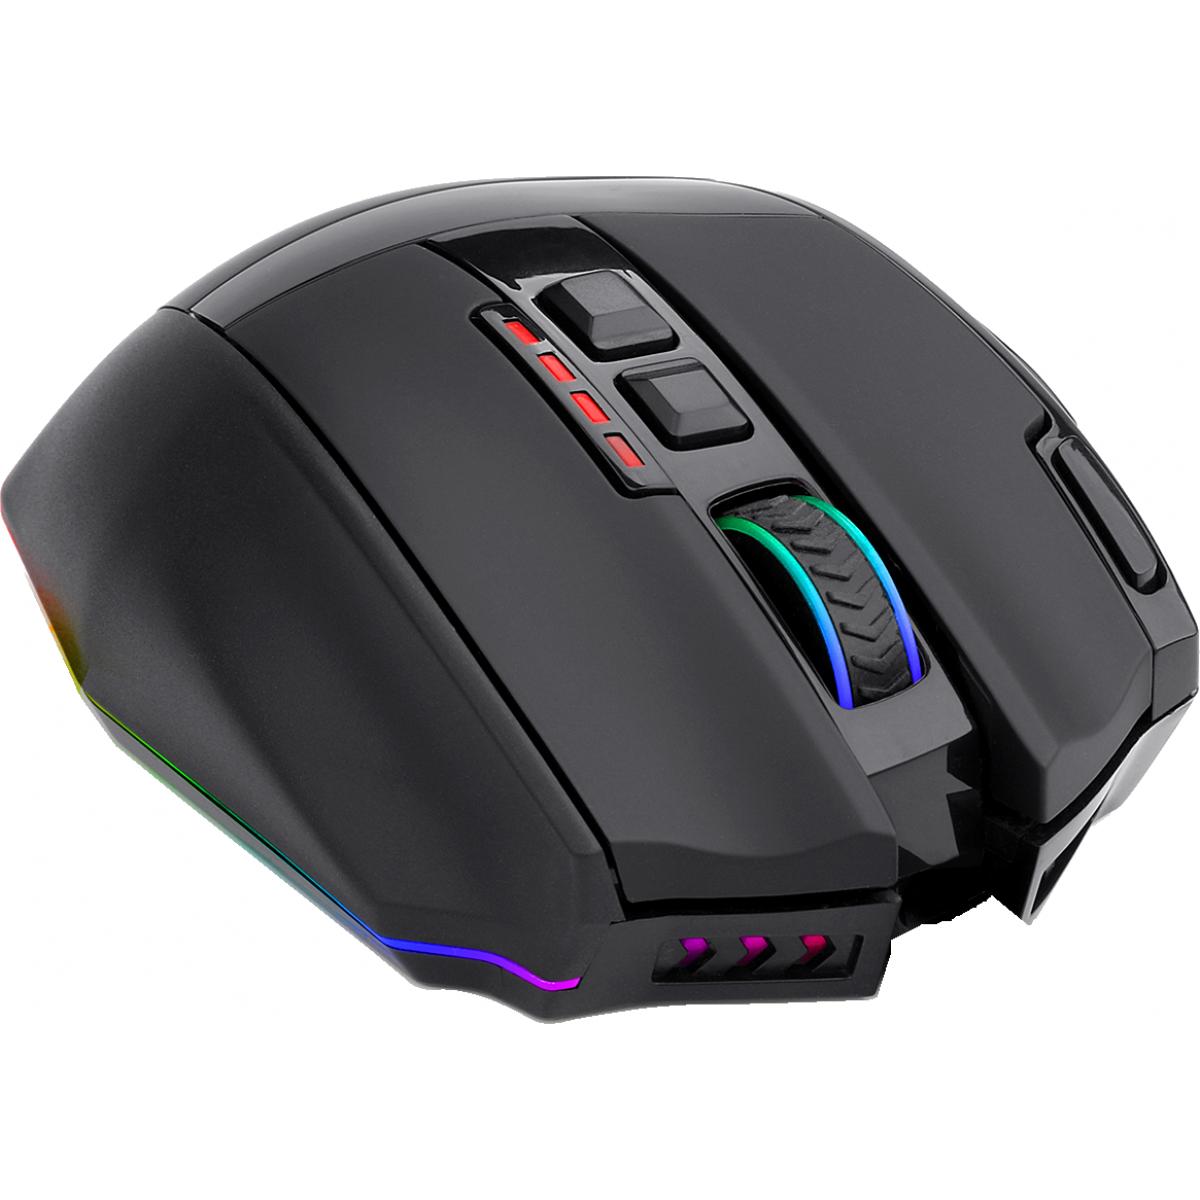 Mouse Gamer Redragon Sniper Pro M801P RGB, 16000 DPI, Wireless, 9 Botões Programáveis, Black